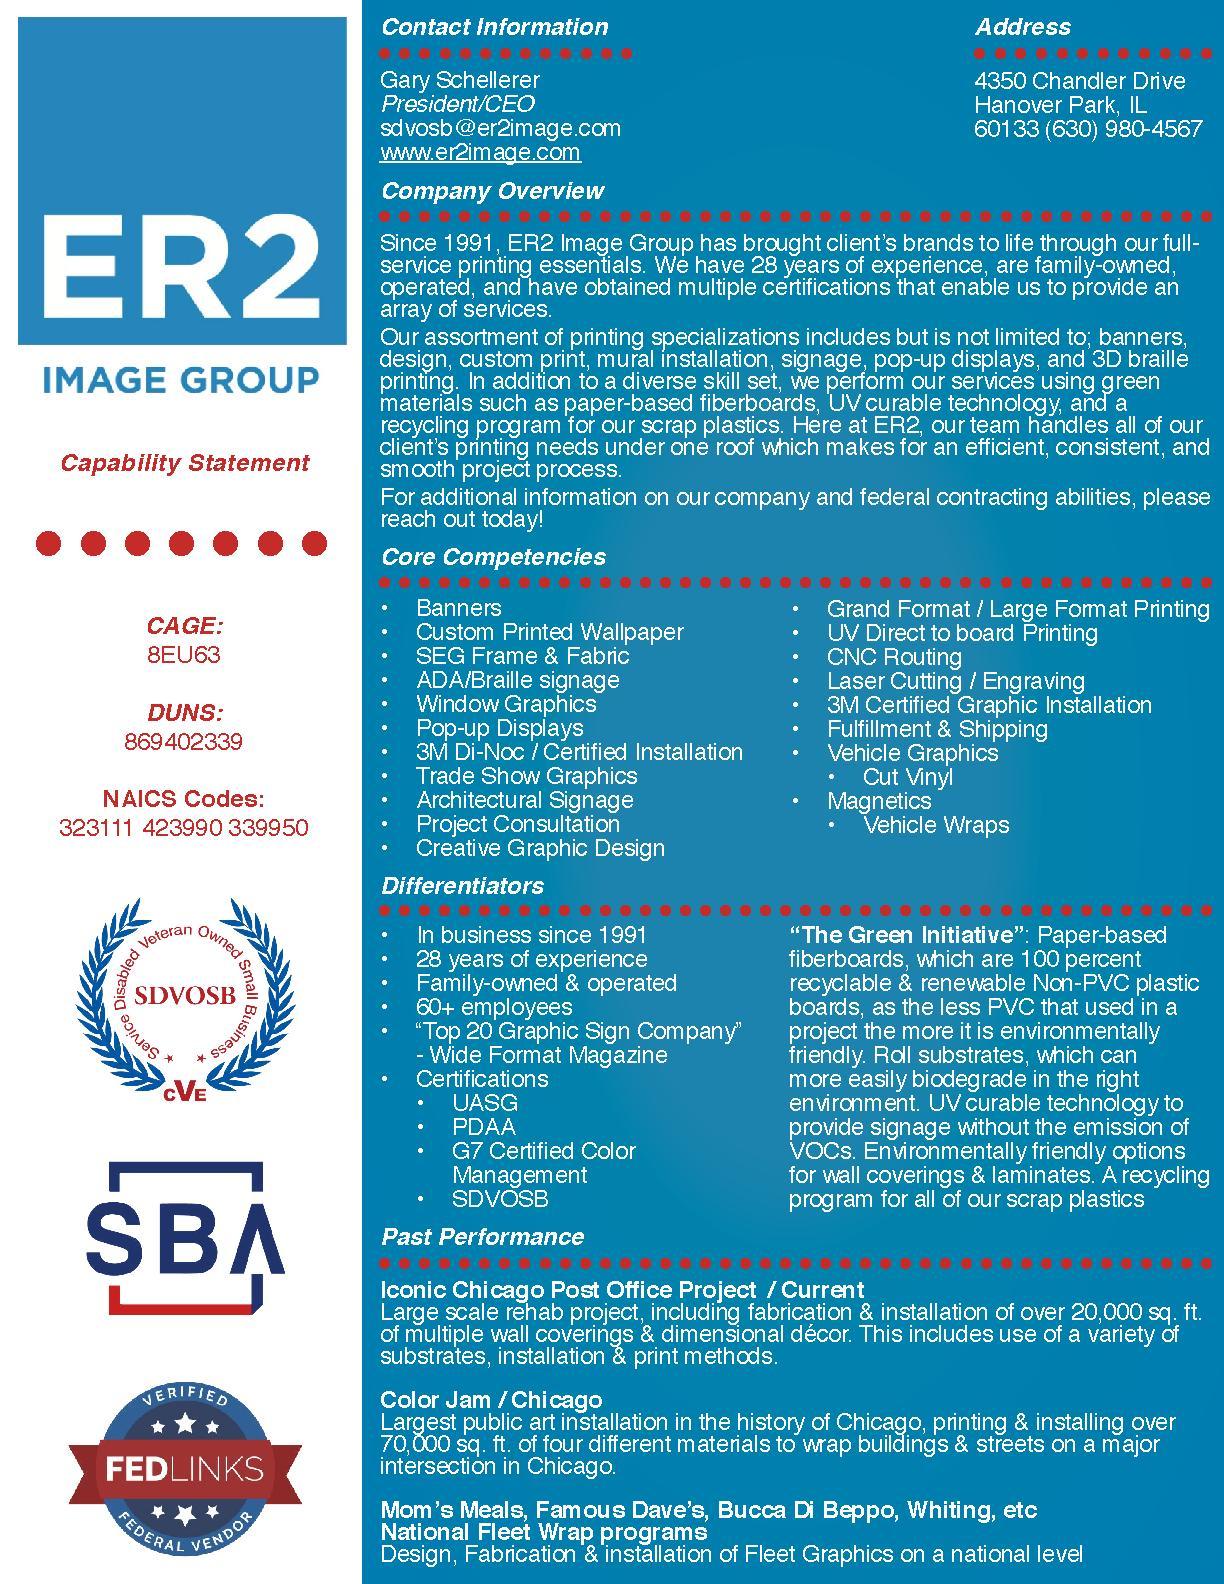 Er2 image group capability statement